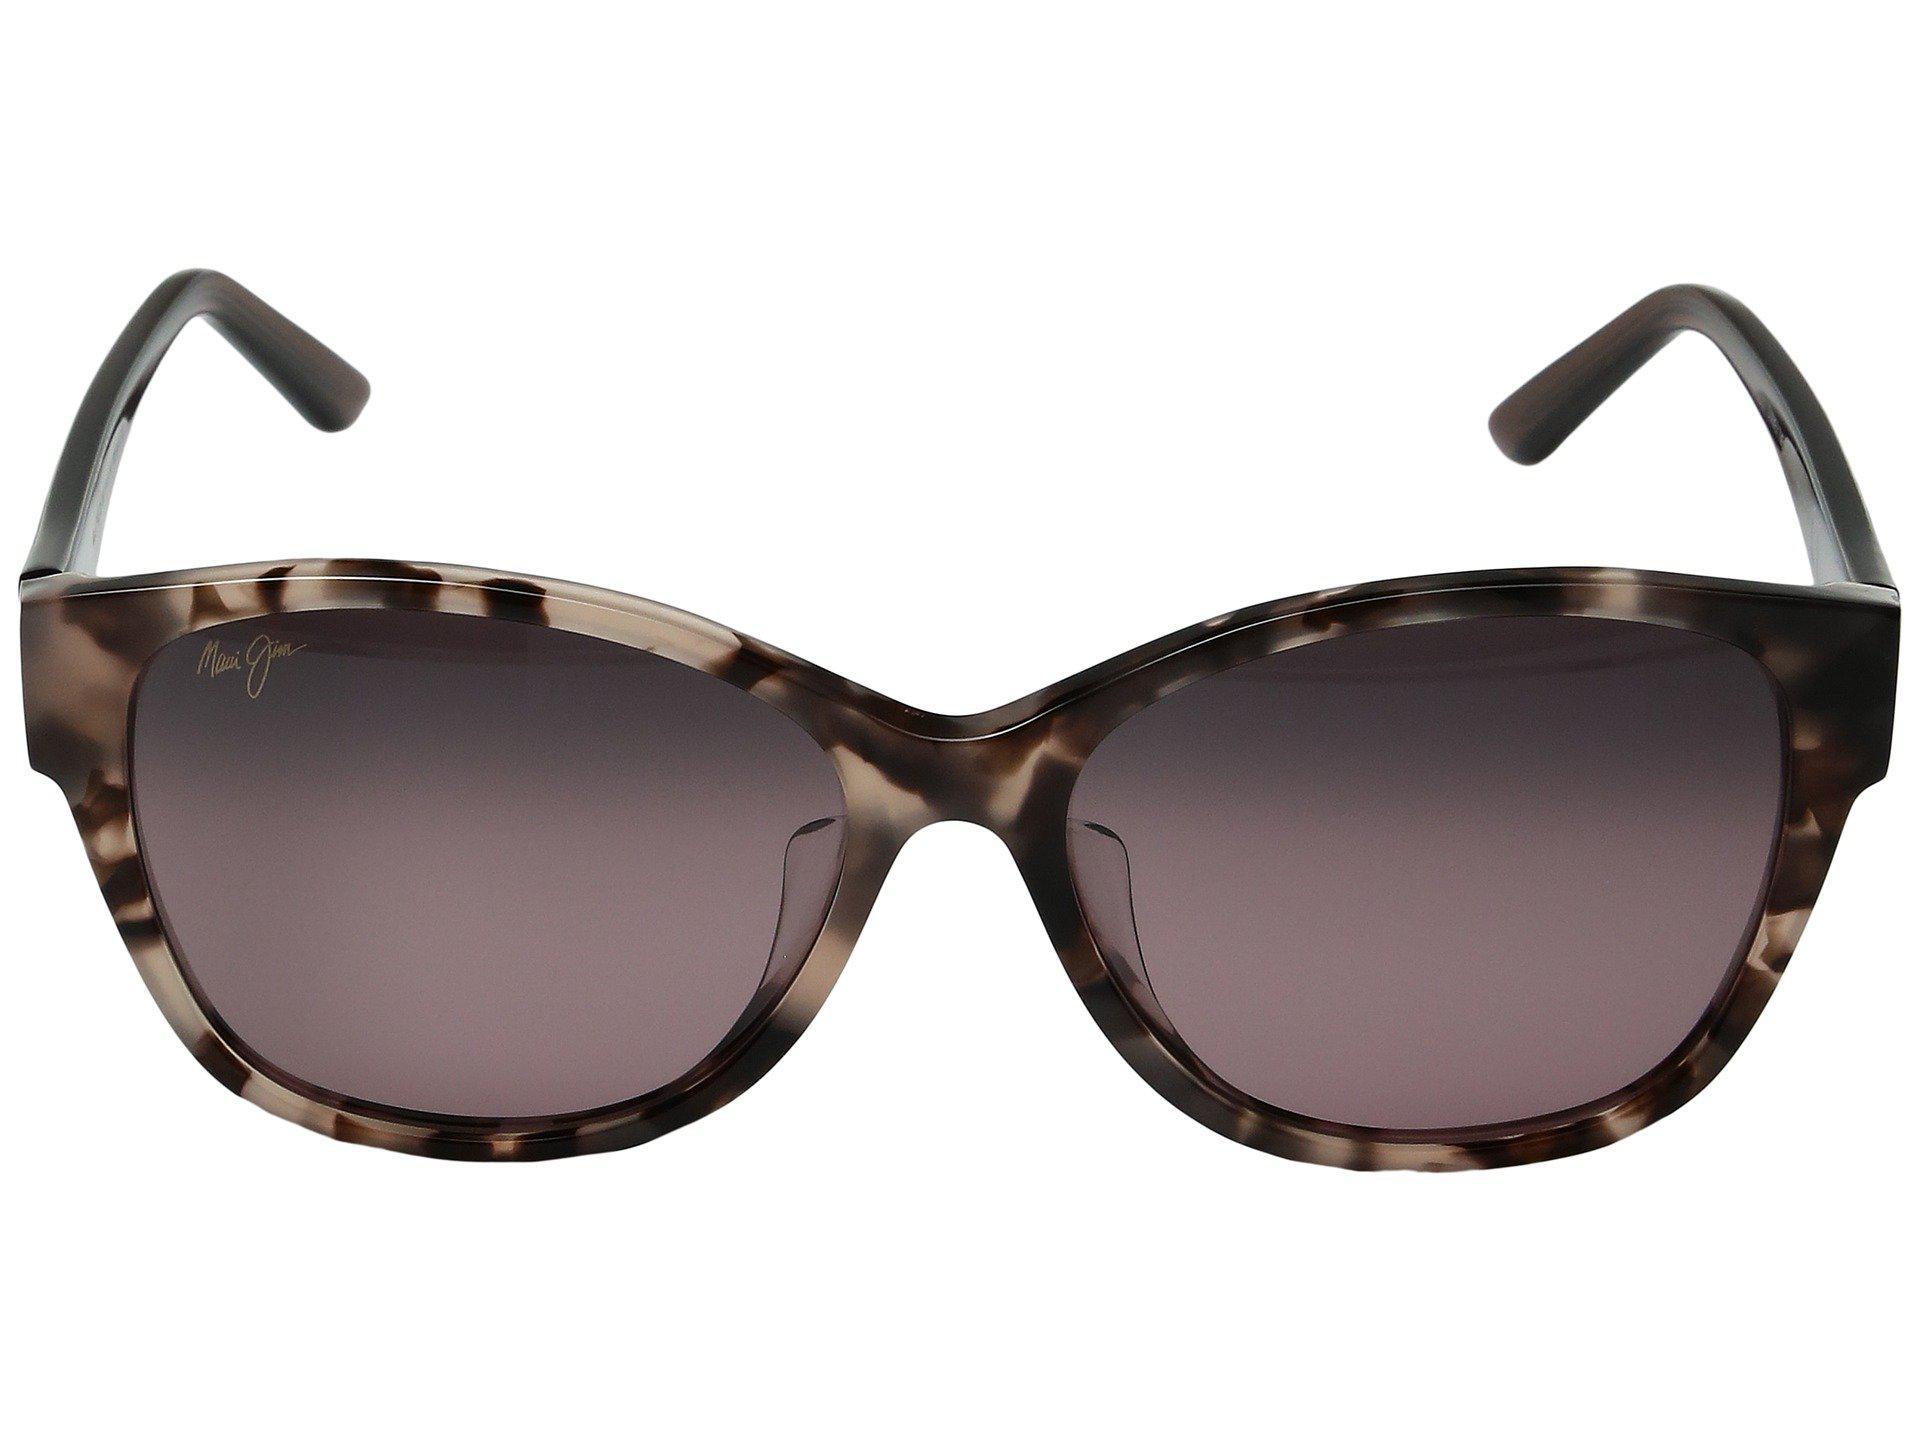 74536acde2a Lyst - Maui Jim Summer Time (pink Tokyo Tortoise) Fashion Sunglasses ...